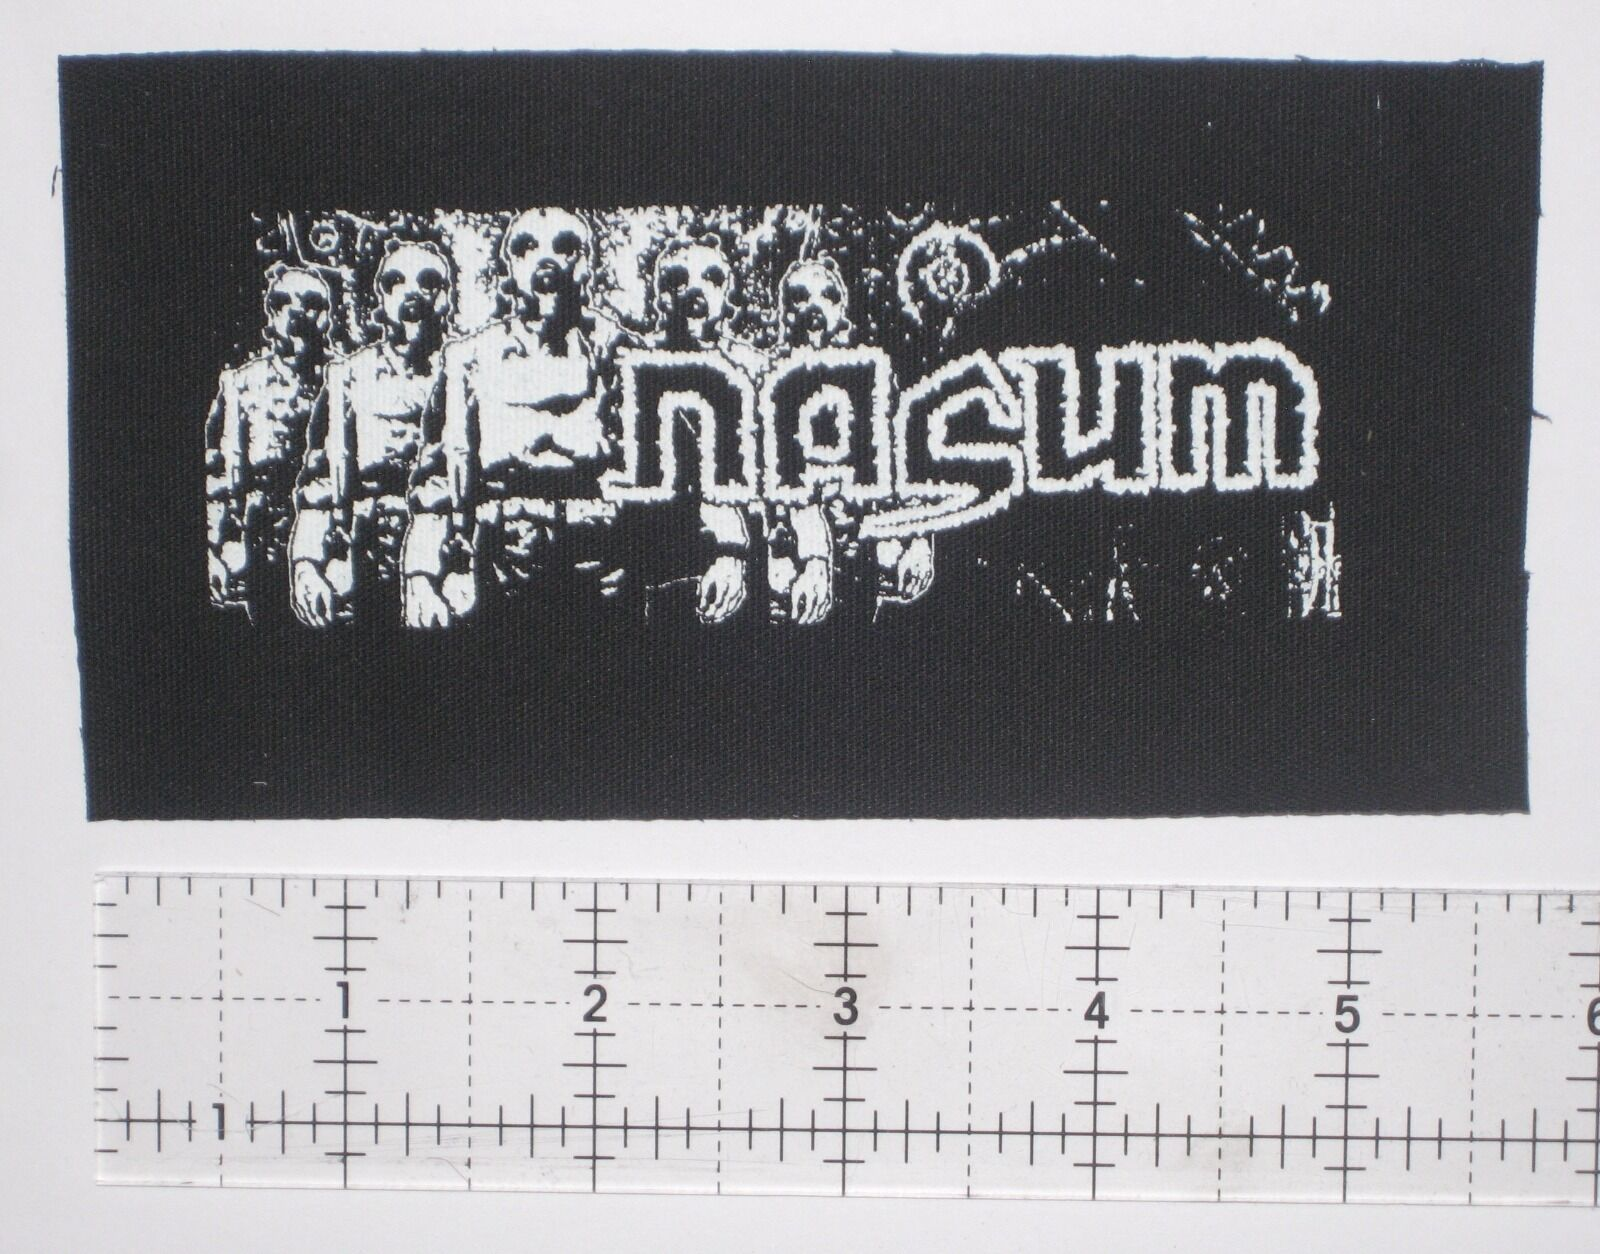 NASUM - DIY Crust Punk Patch Unholy Grave Despise you D-beat Hellnation Dropdead